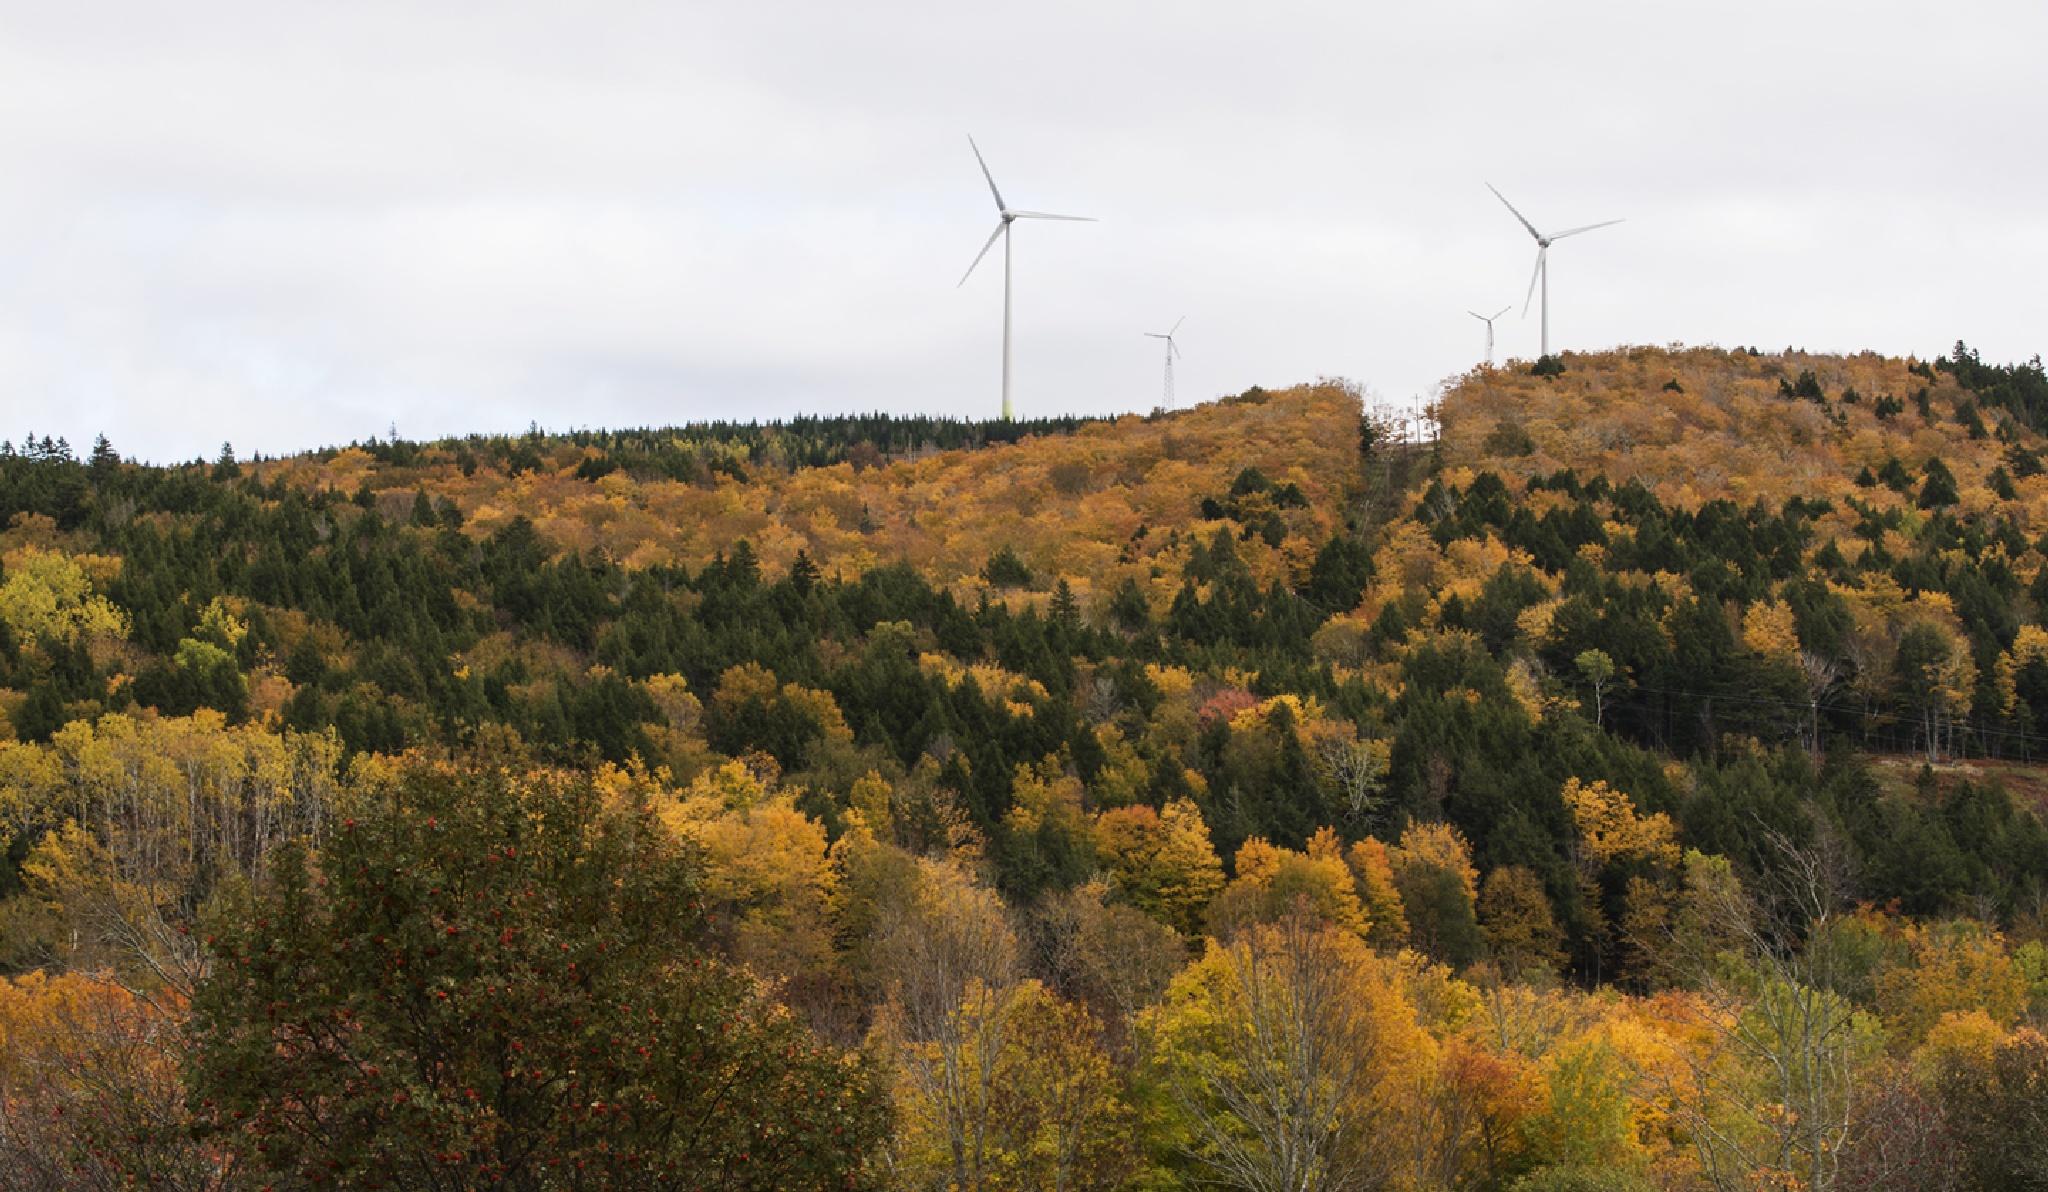 Wind Turbines on the Horizon  by Wayne L. Talbot